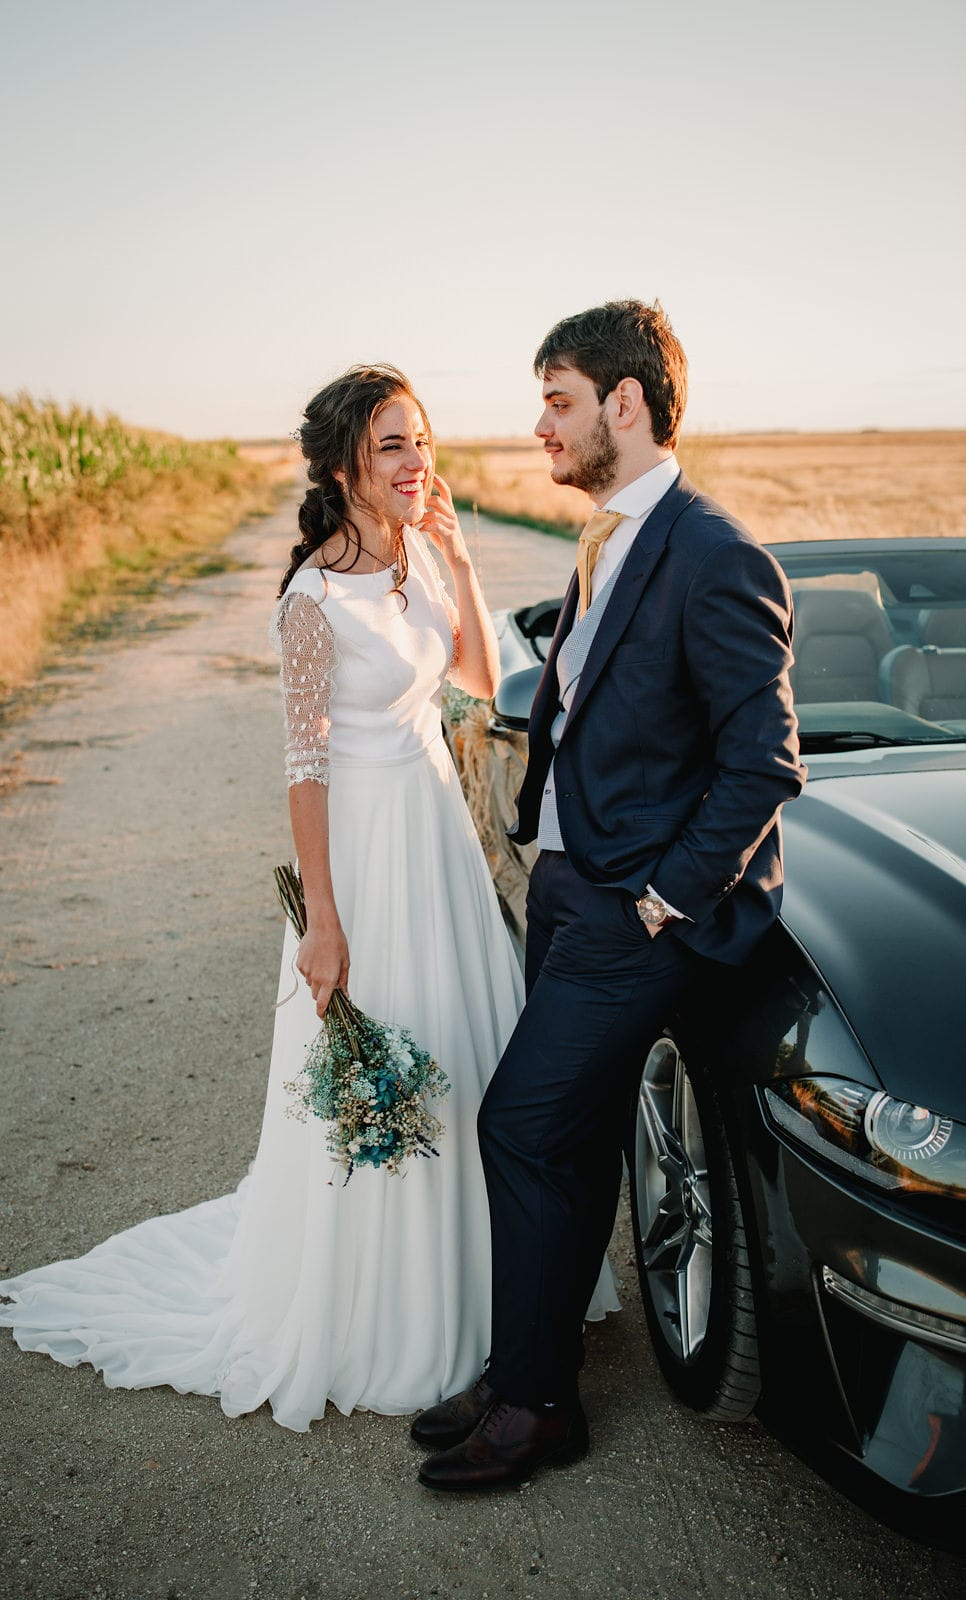 celebrar boda en pandemia